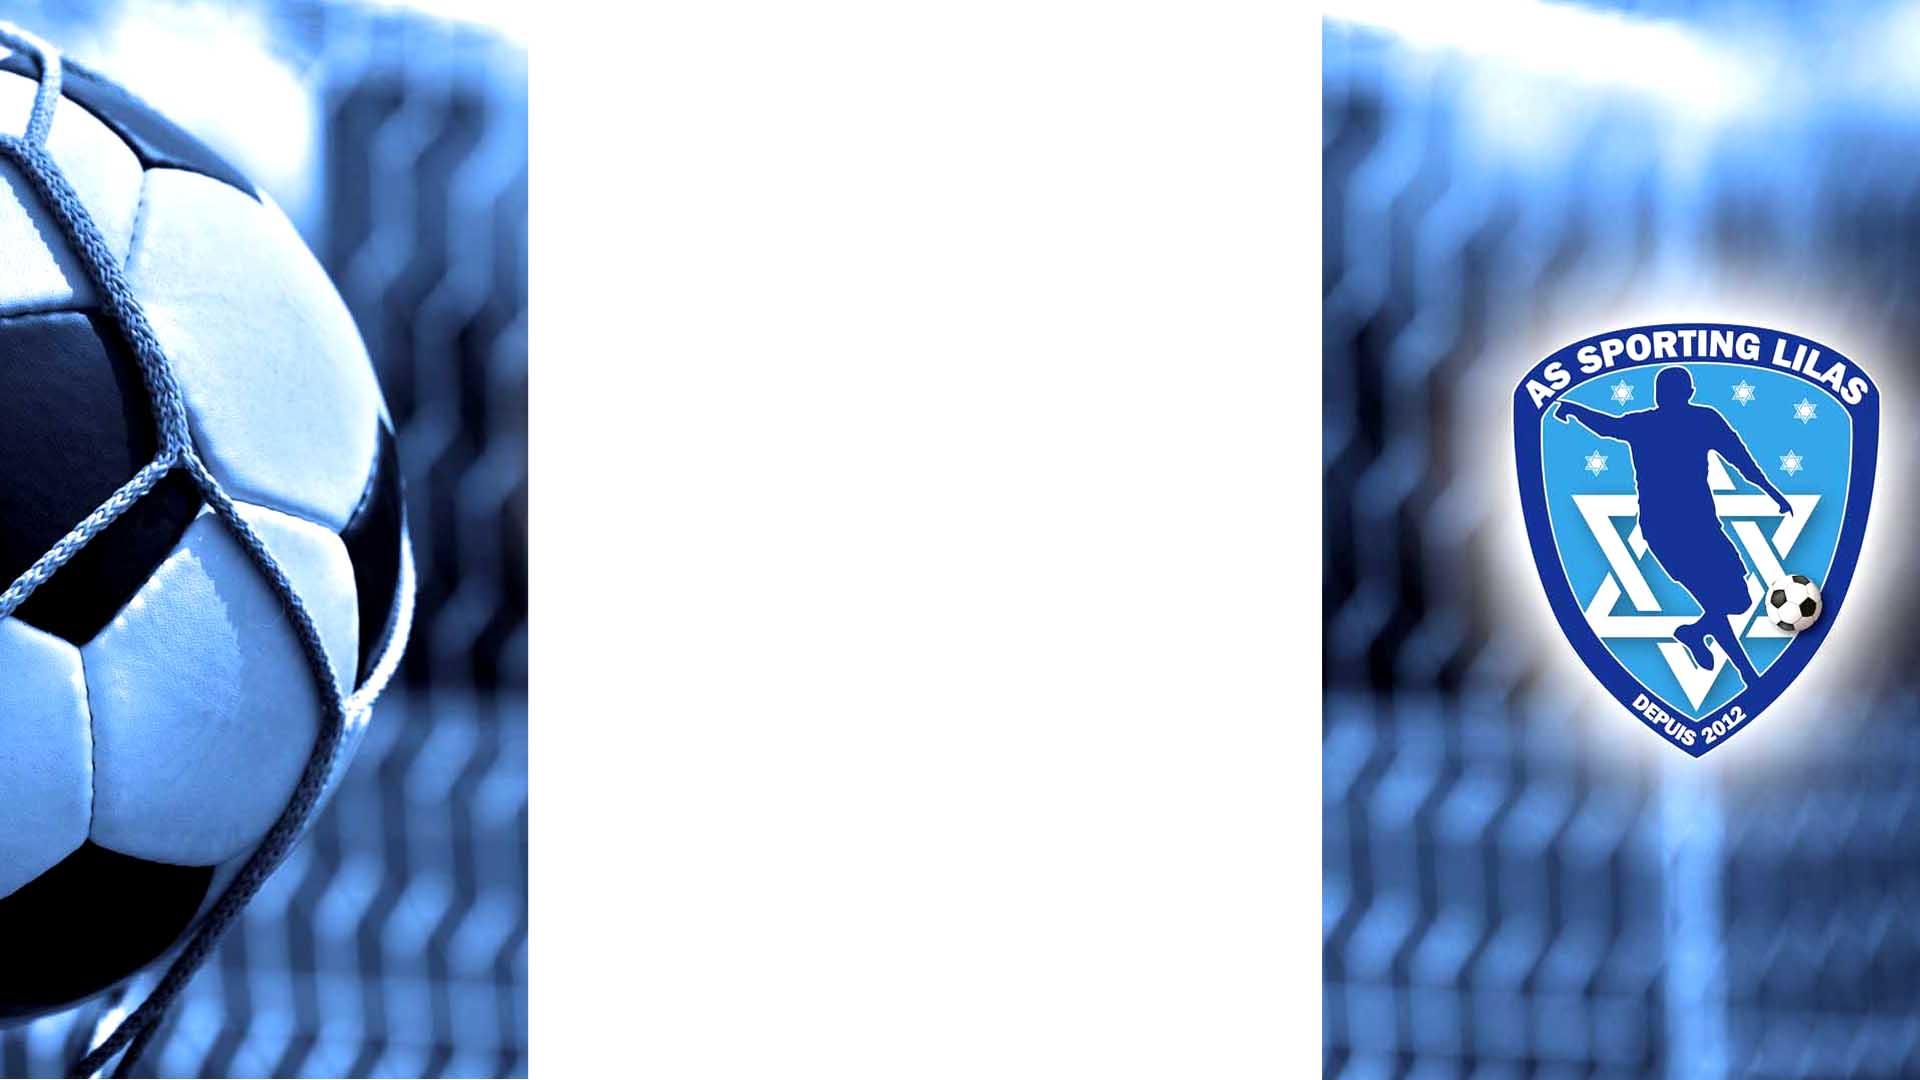 csv-background-assportinglilas-good